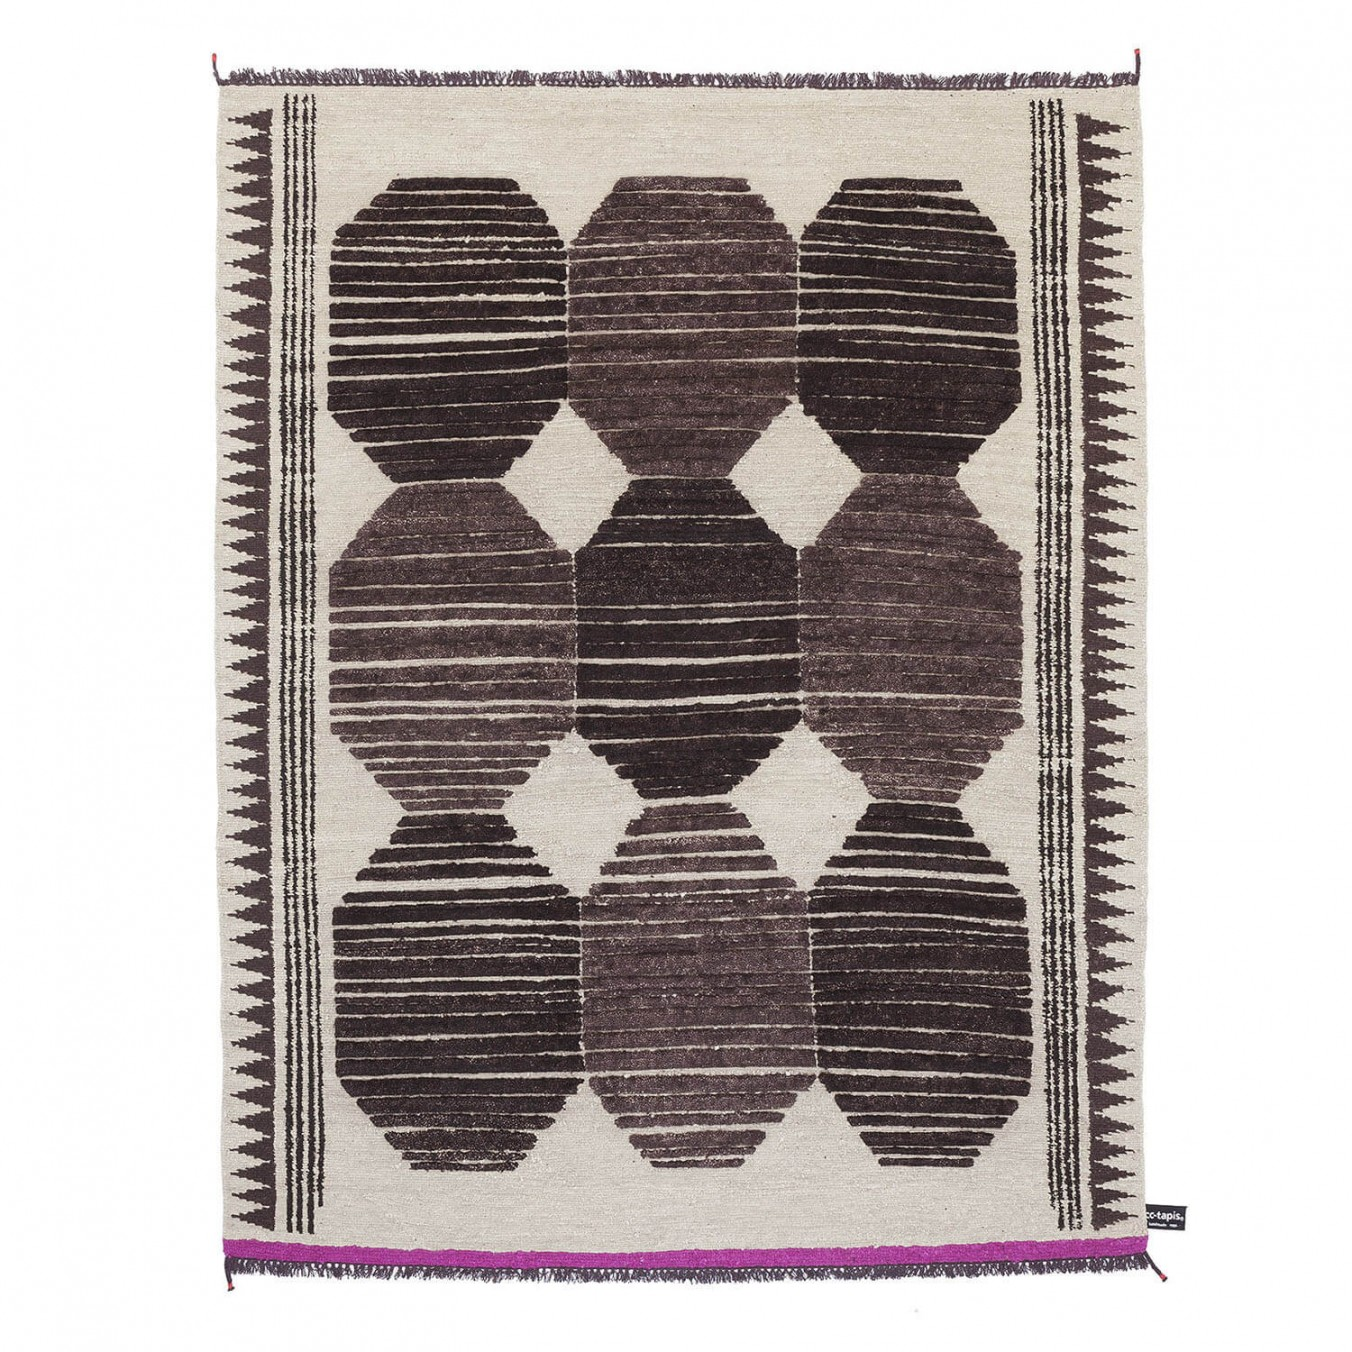 Primitive weave 3